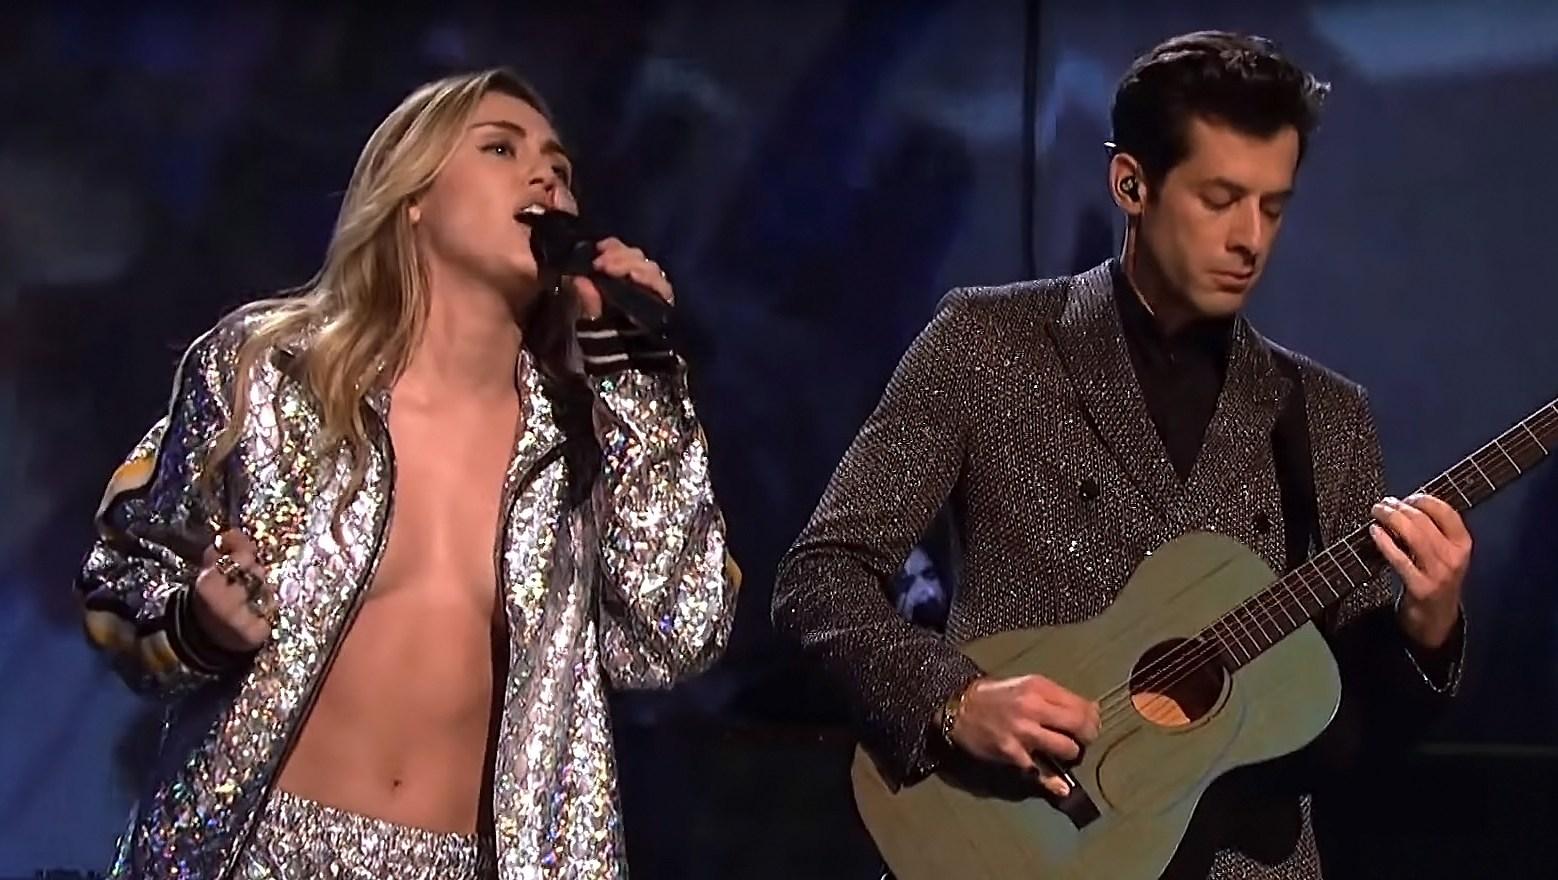 Miley Cyrus Sings Topless, Risks a Nip-Slip on SNL: Reactions